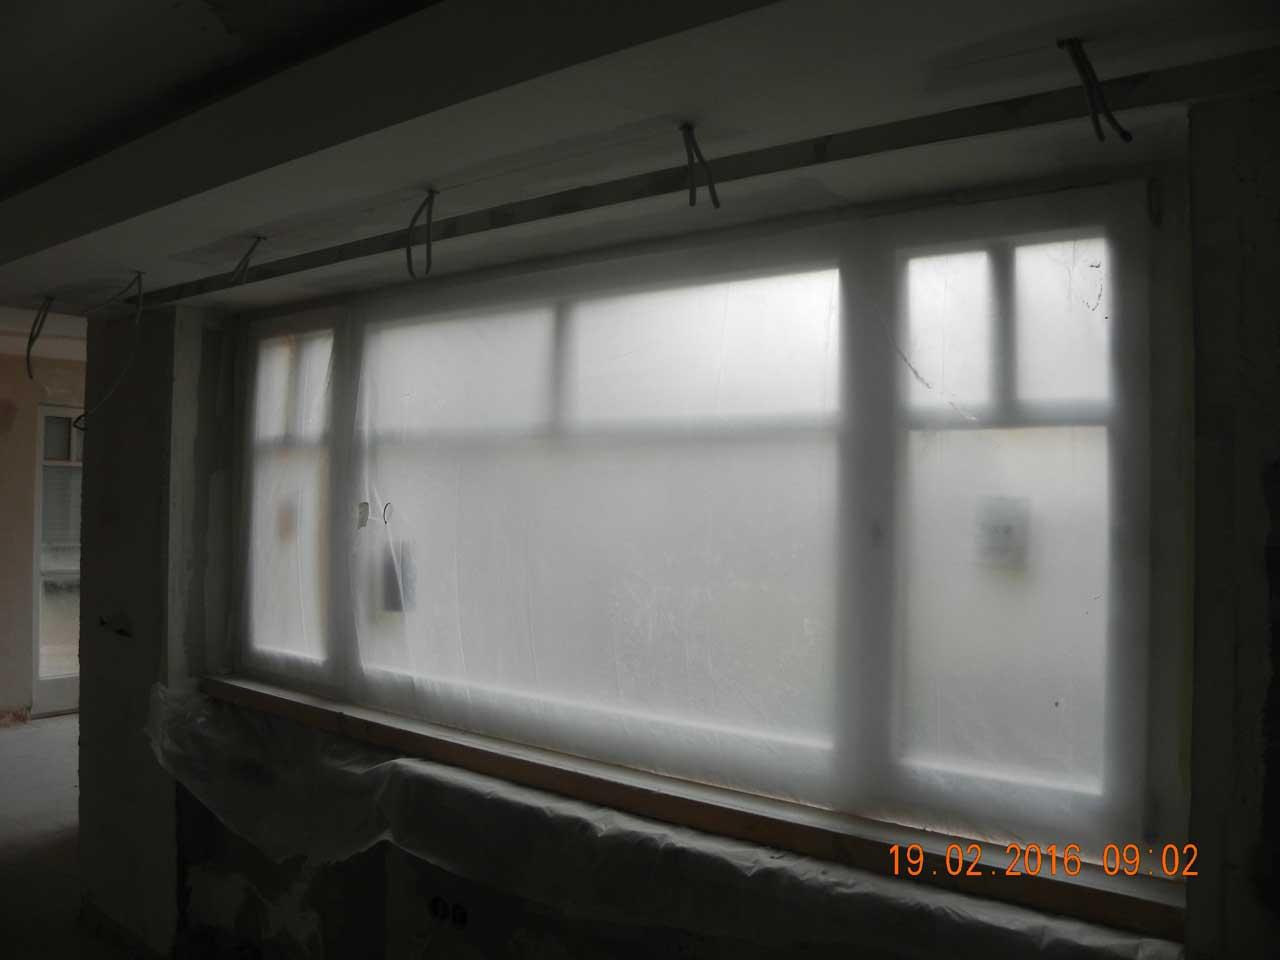 Küche & Kamin - Umbau 15